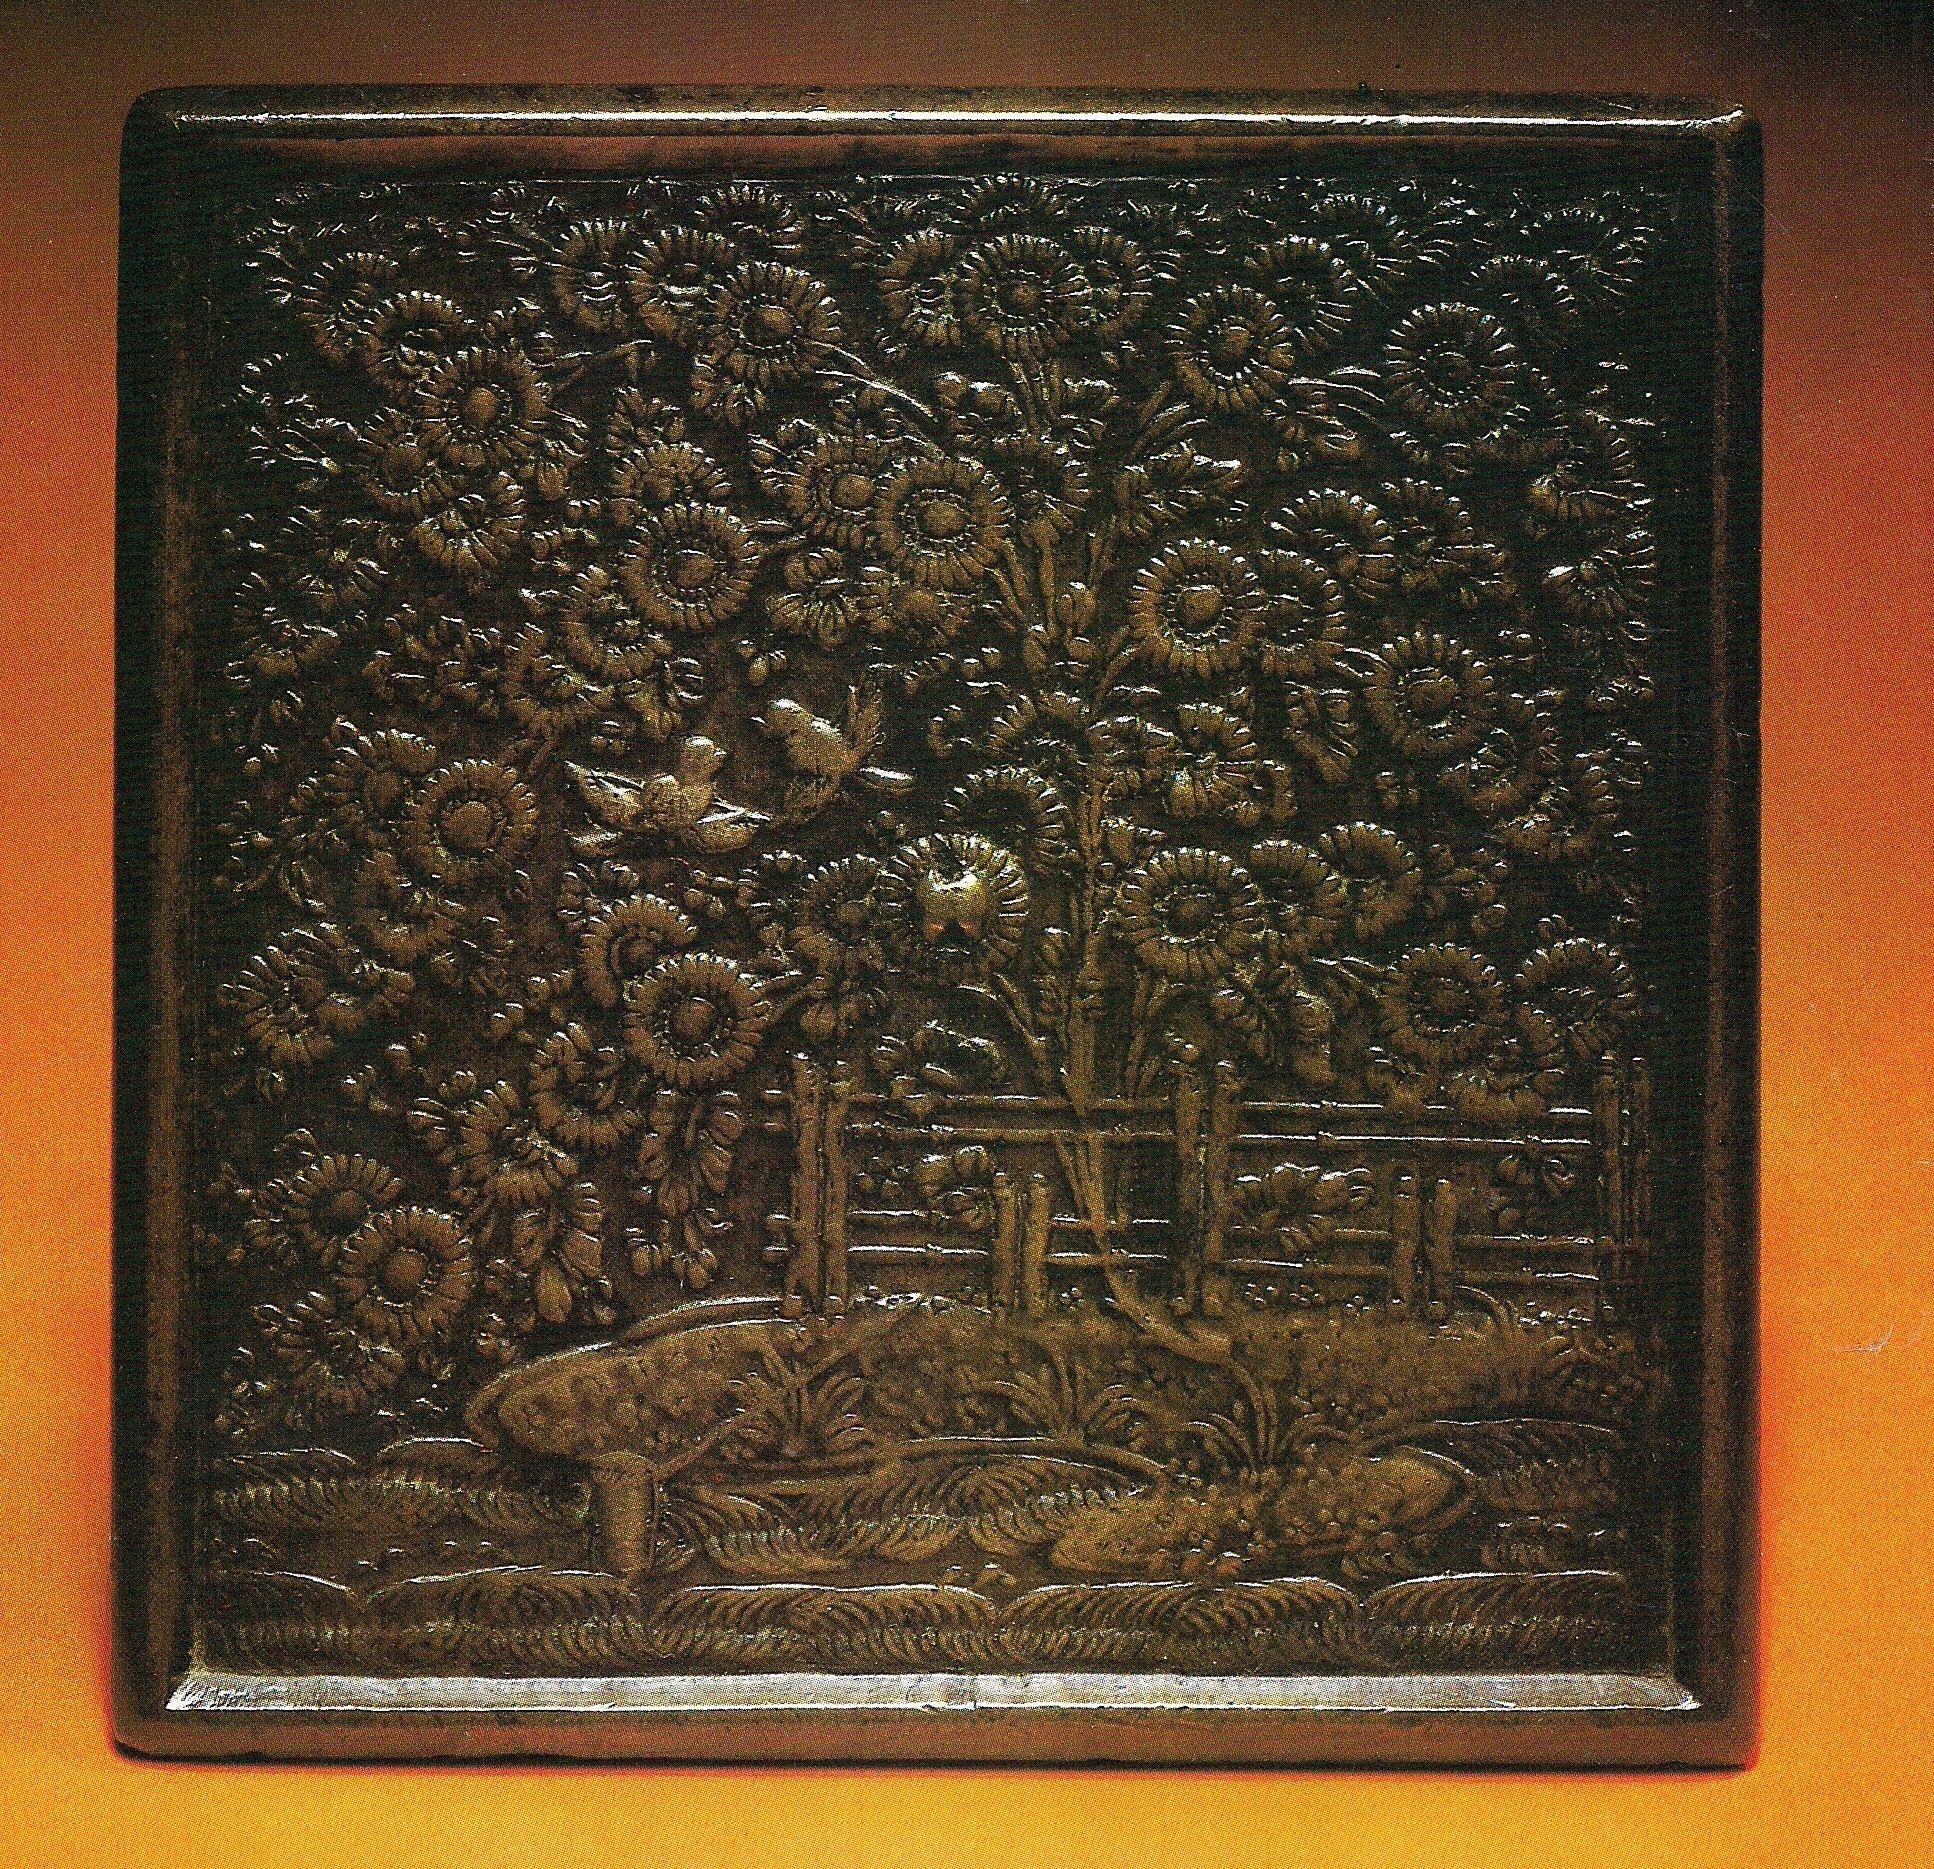 Japanese mirror, Kamakura period 1185-1336 A.D.